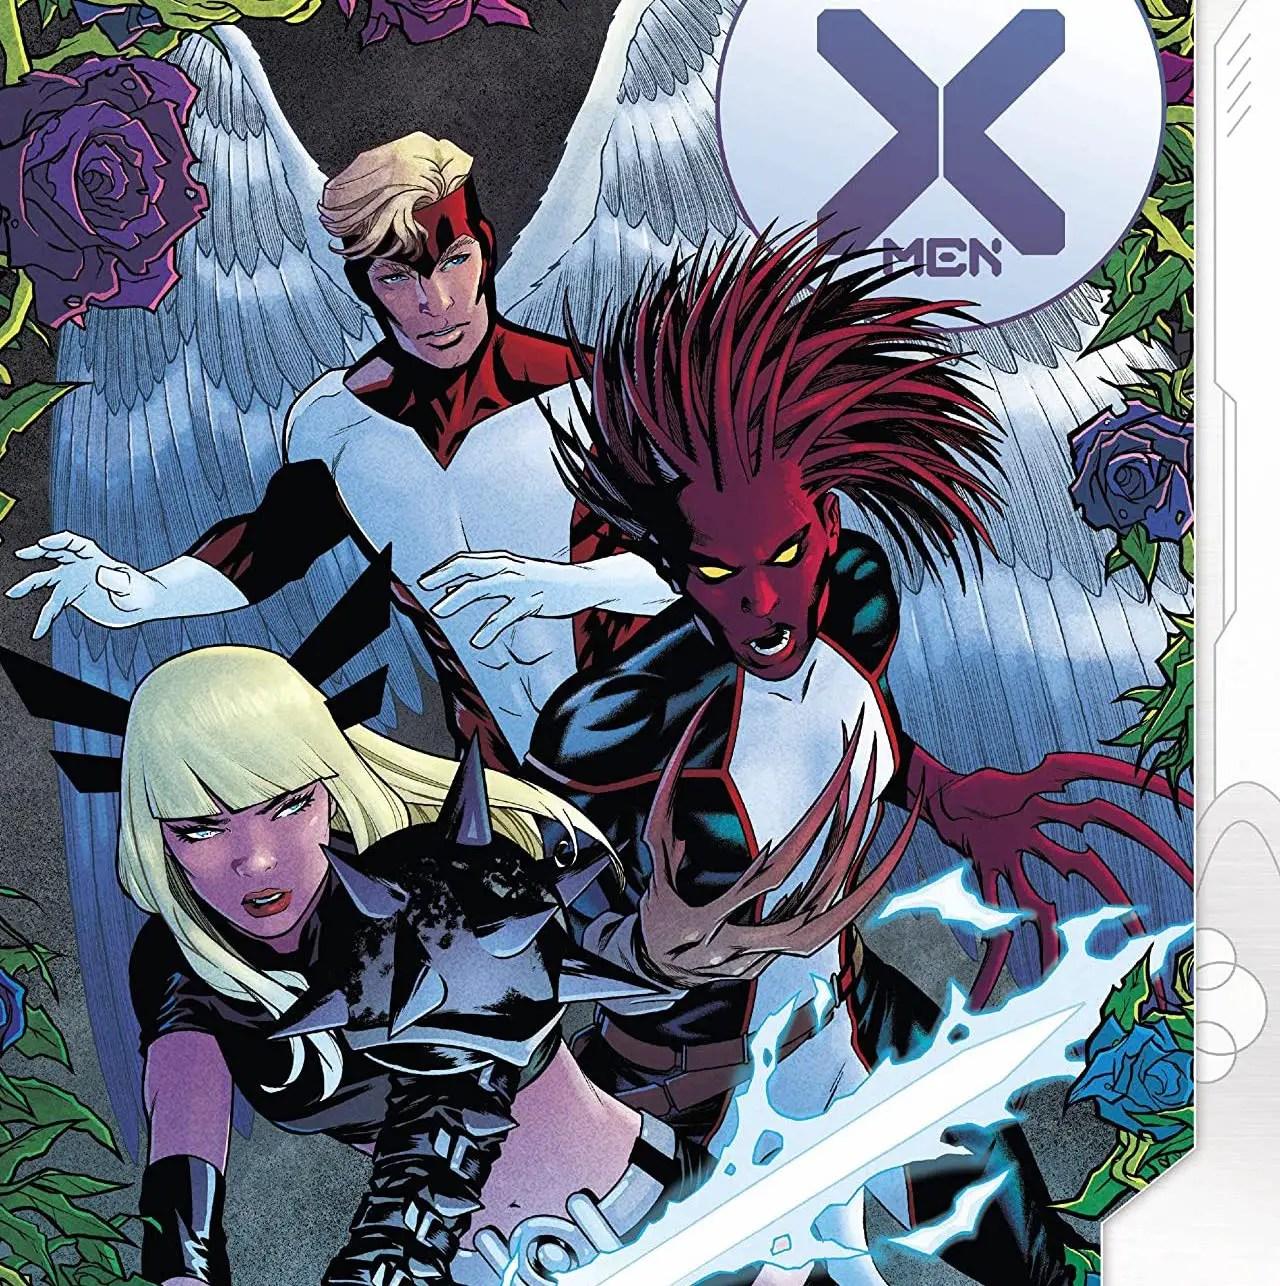 'Empyre: X-Men' #1 review: A sharply written tie-in